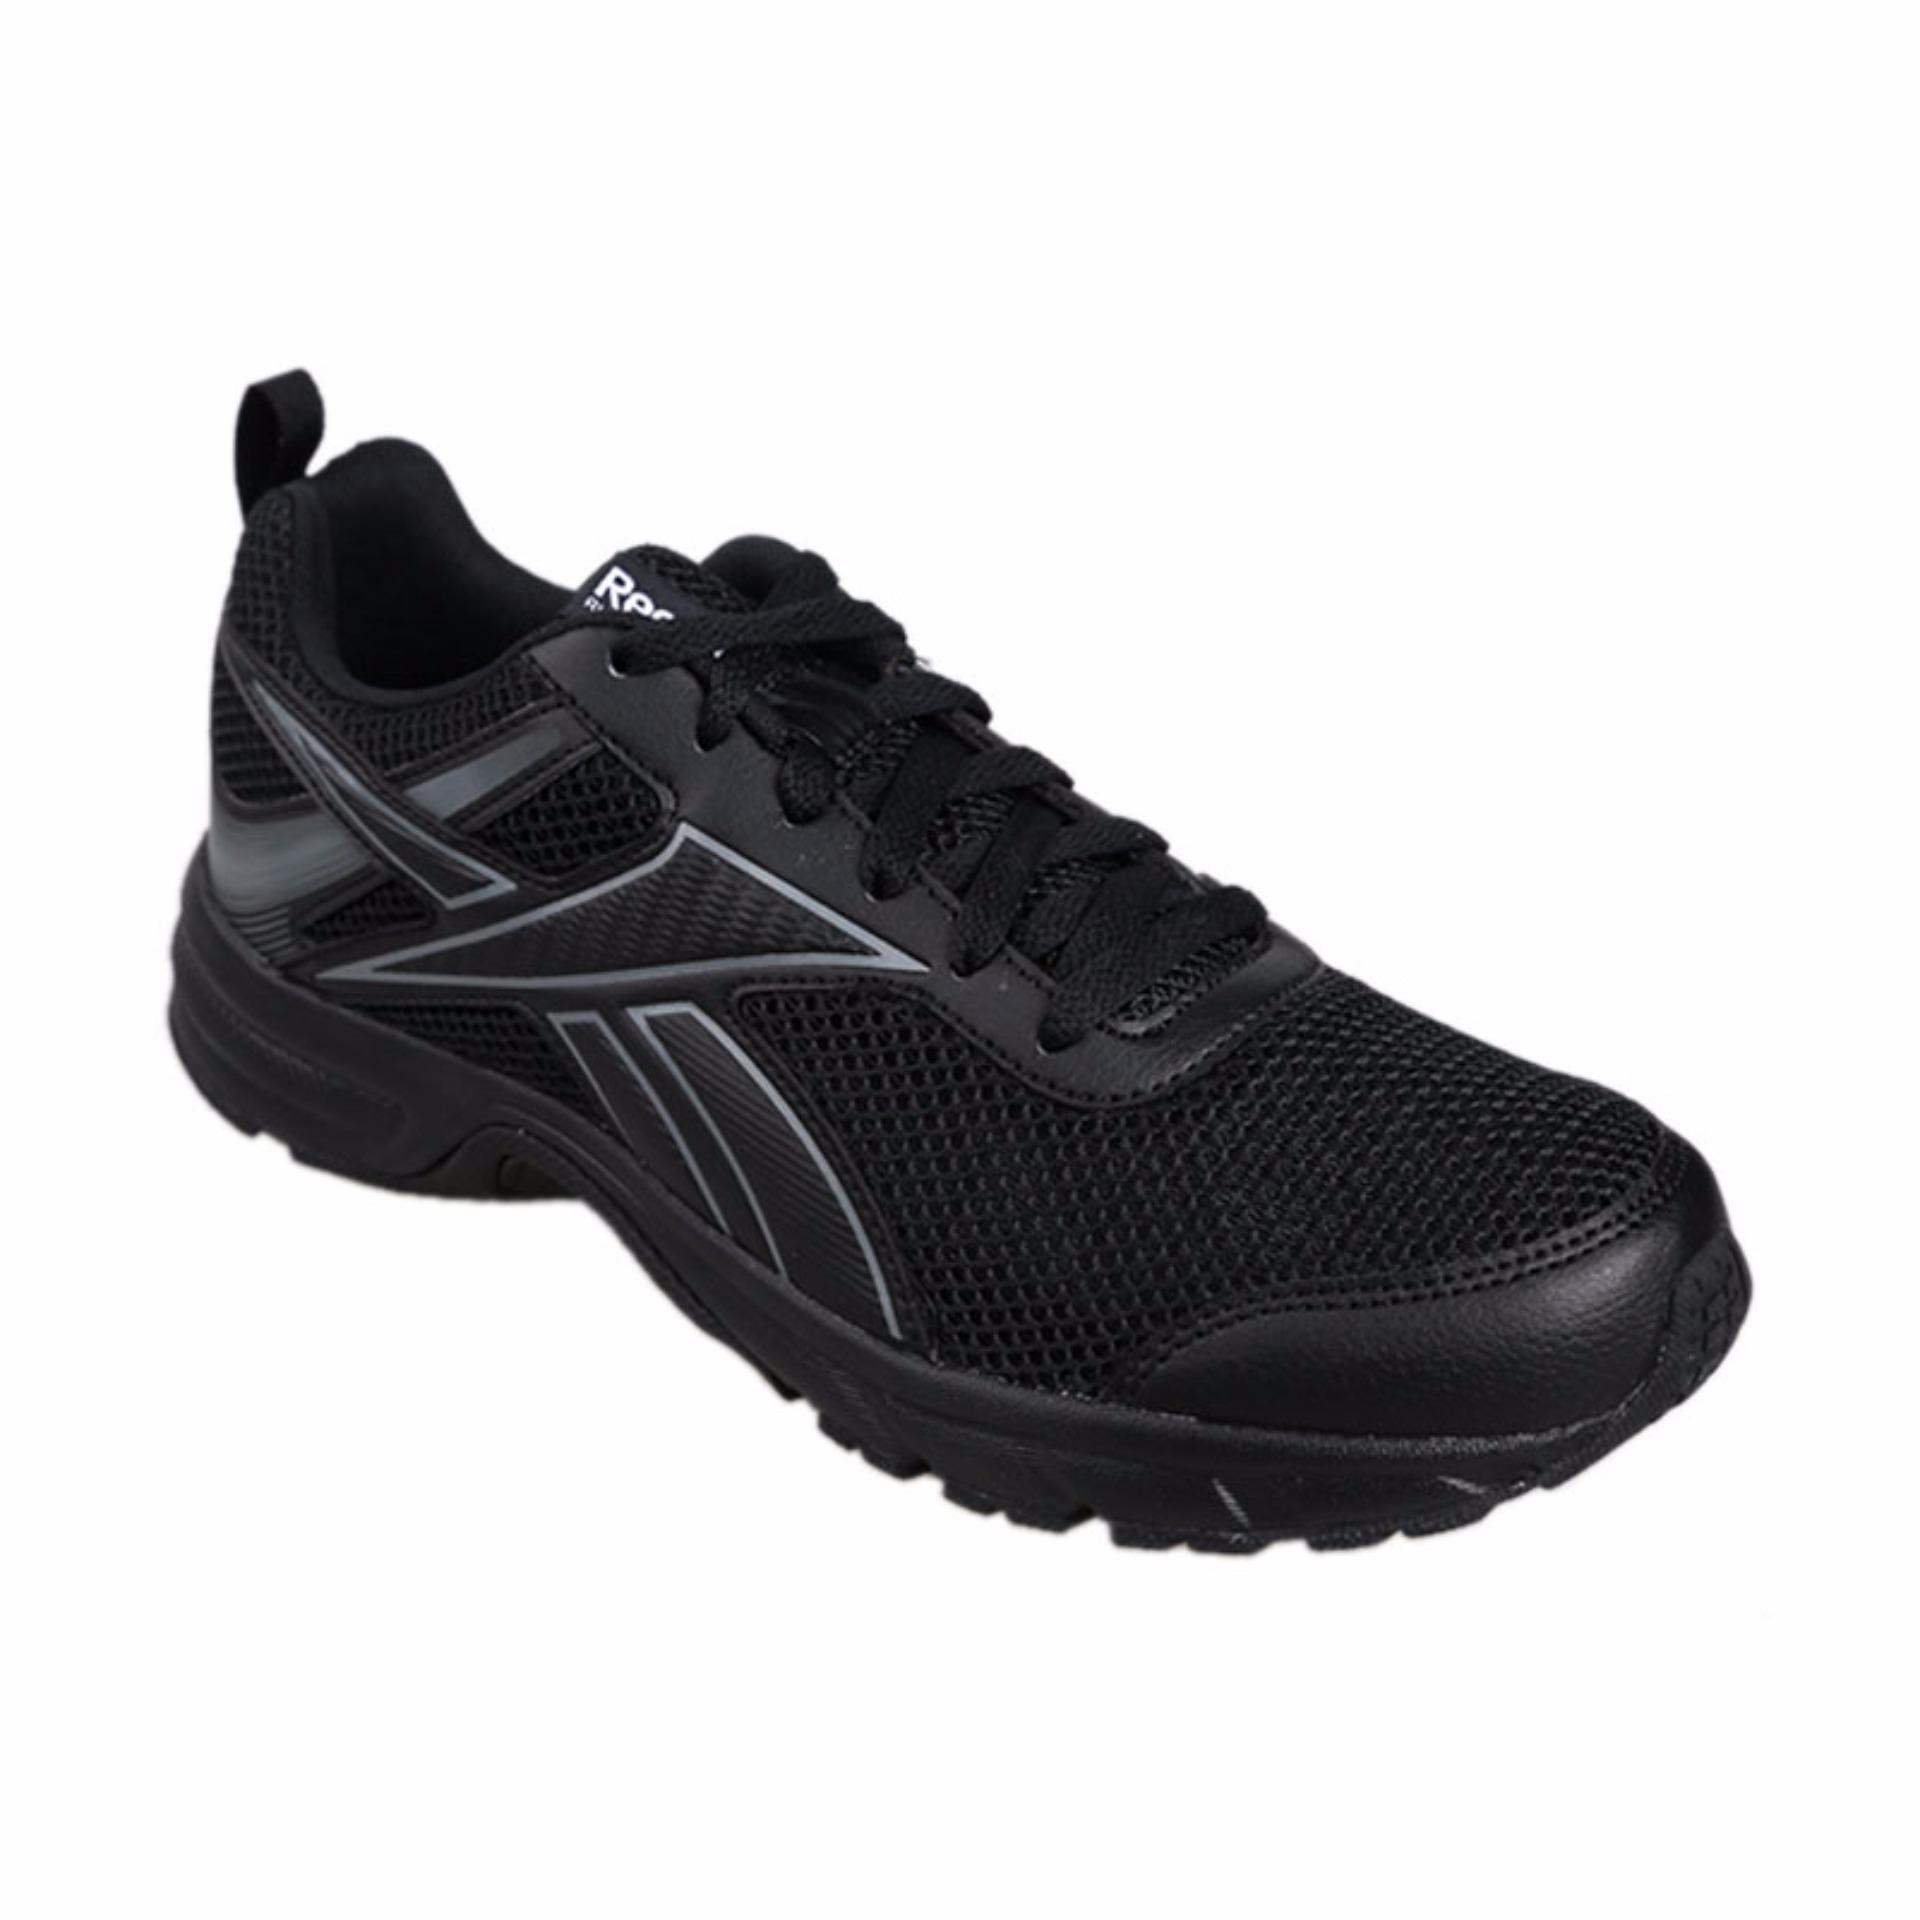 Katalog Reebok Pheehan Run 4 Se Black Sepatu Lari Ar3727 Reebok Terbaru